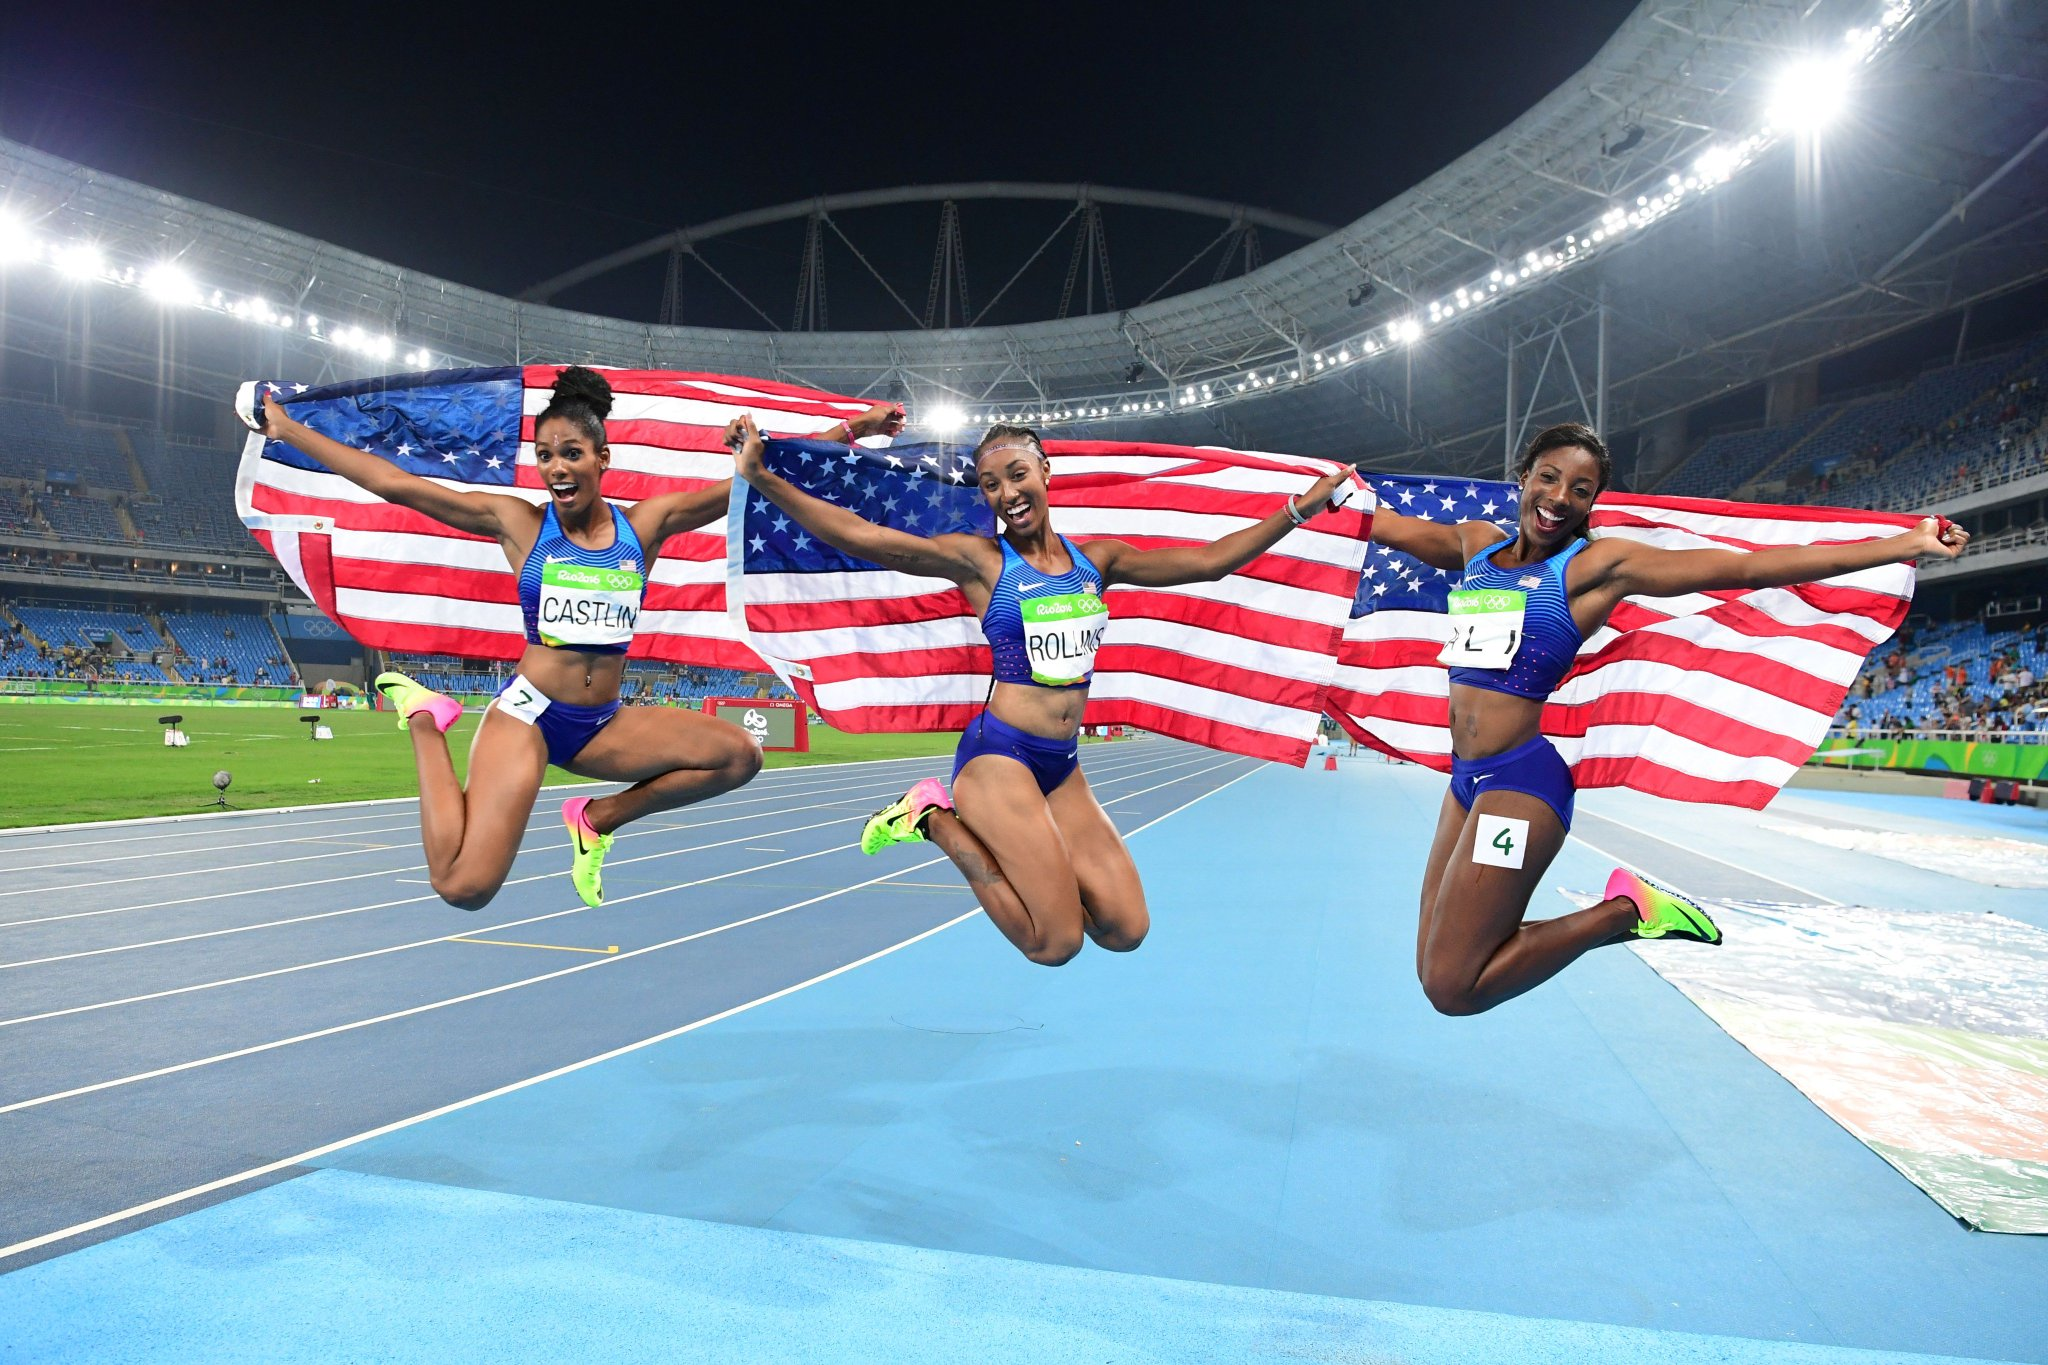 Ok now that's definetely our favourite photo of the day  #Athletics  #Rio2016 #Olympics https://t.co/G9cxf23rov